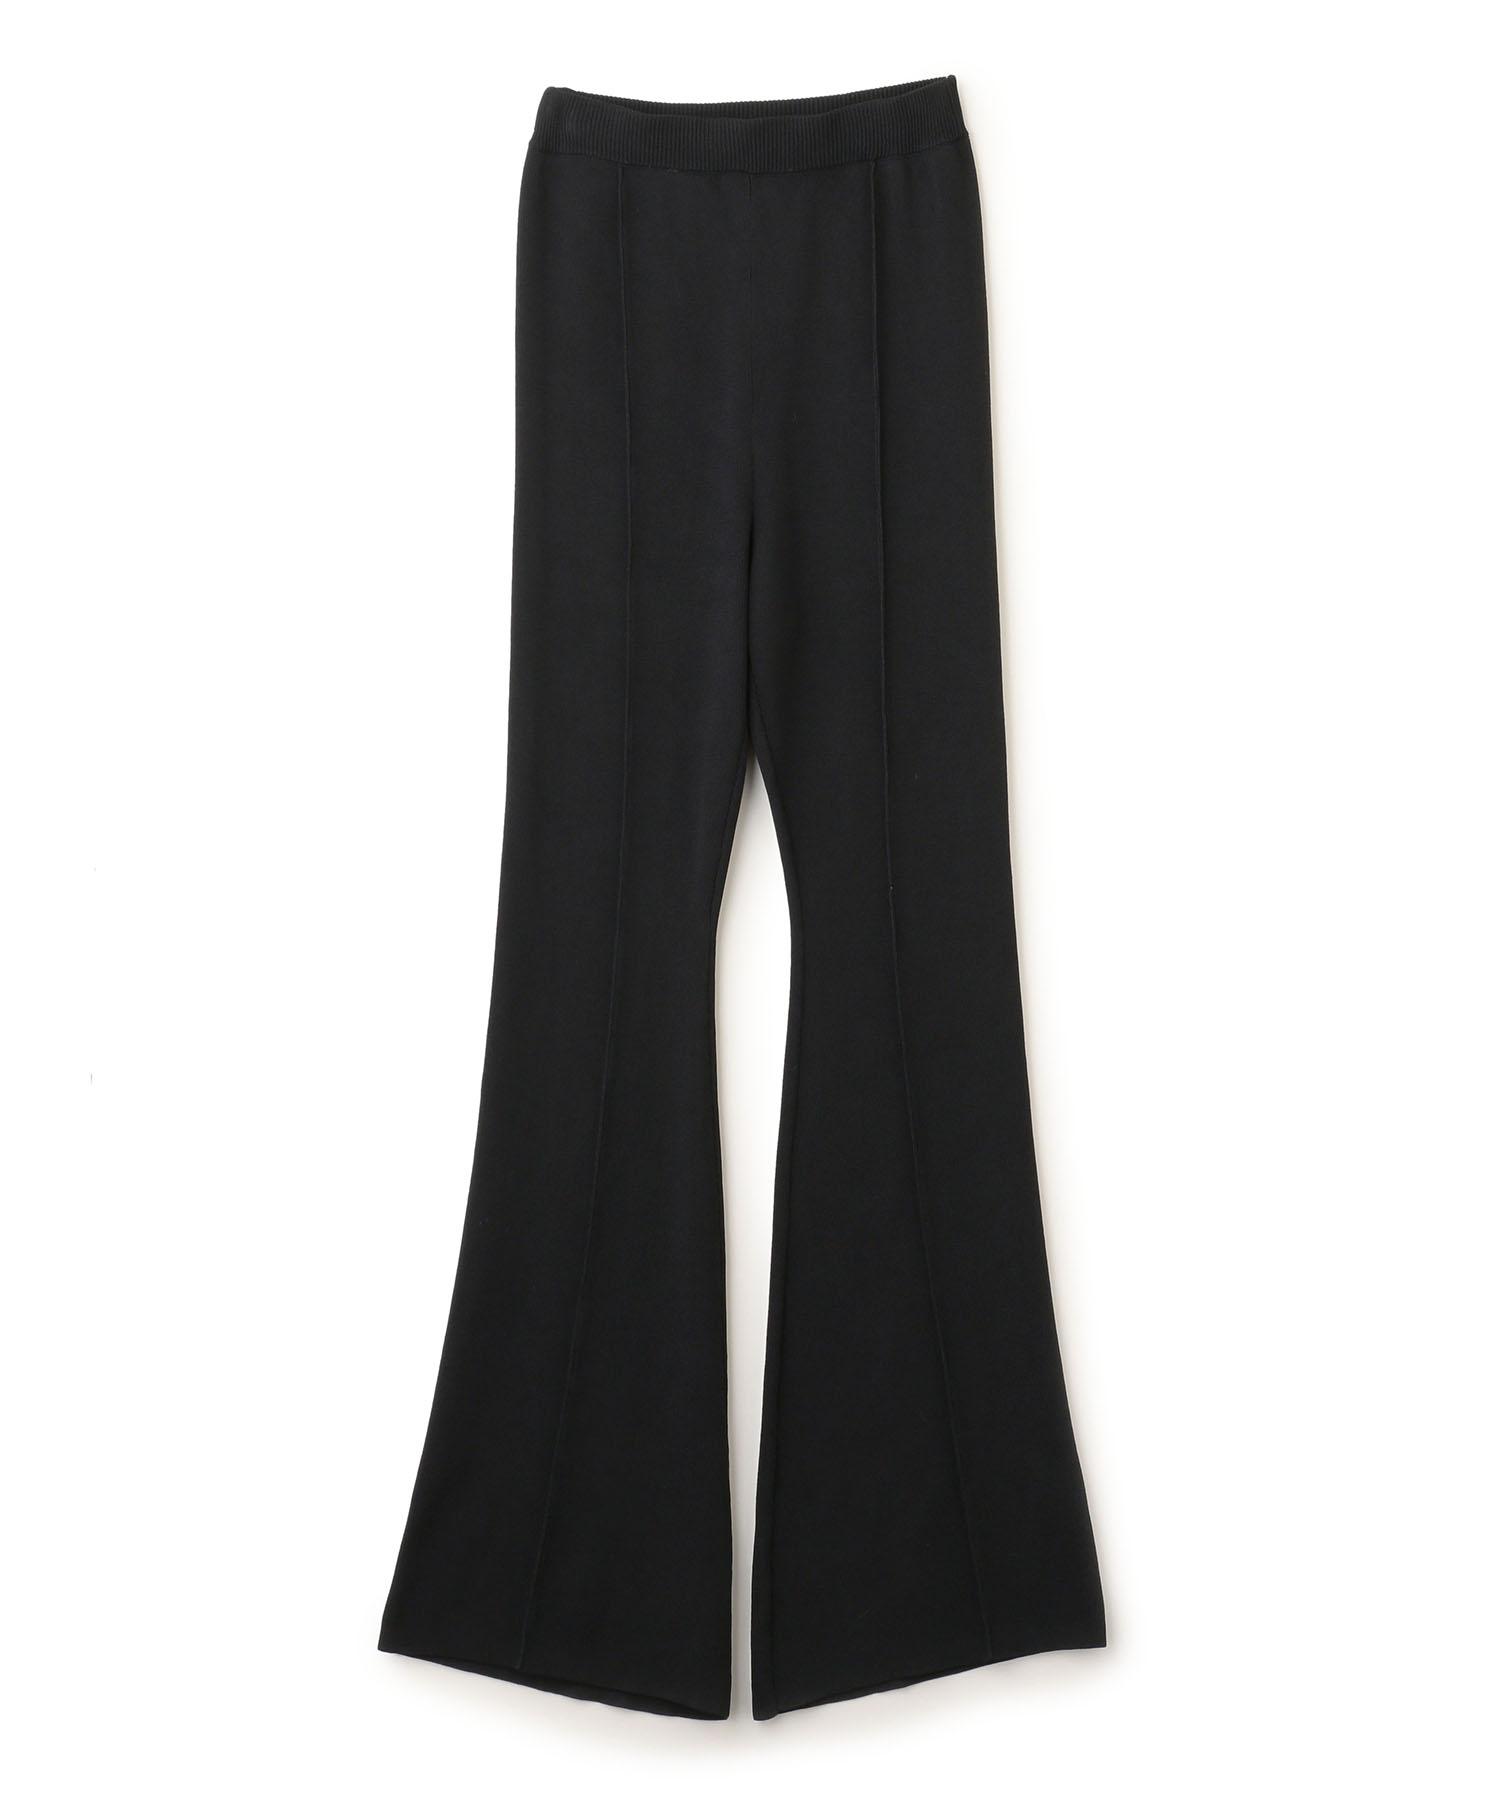 【先行予約10%OFF・送料無料】Bell Bottom Knit Pants